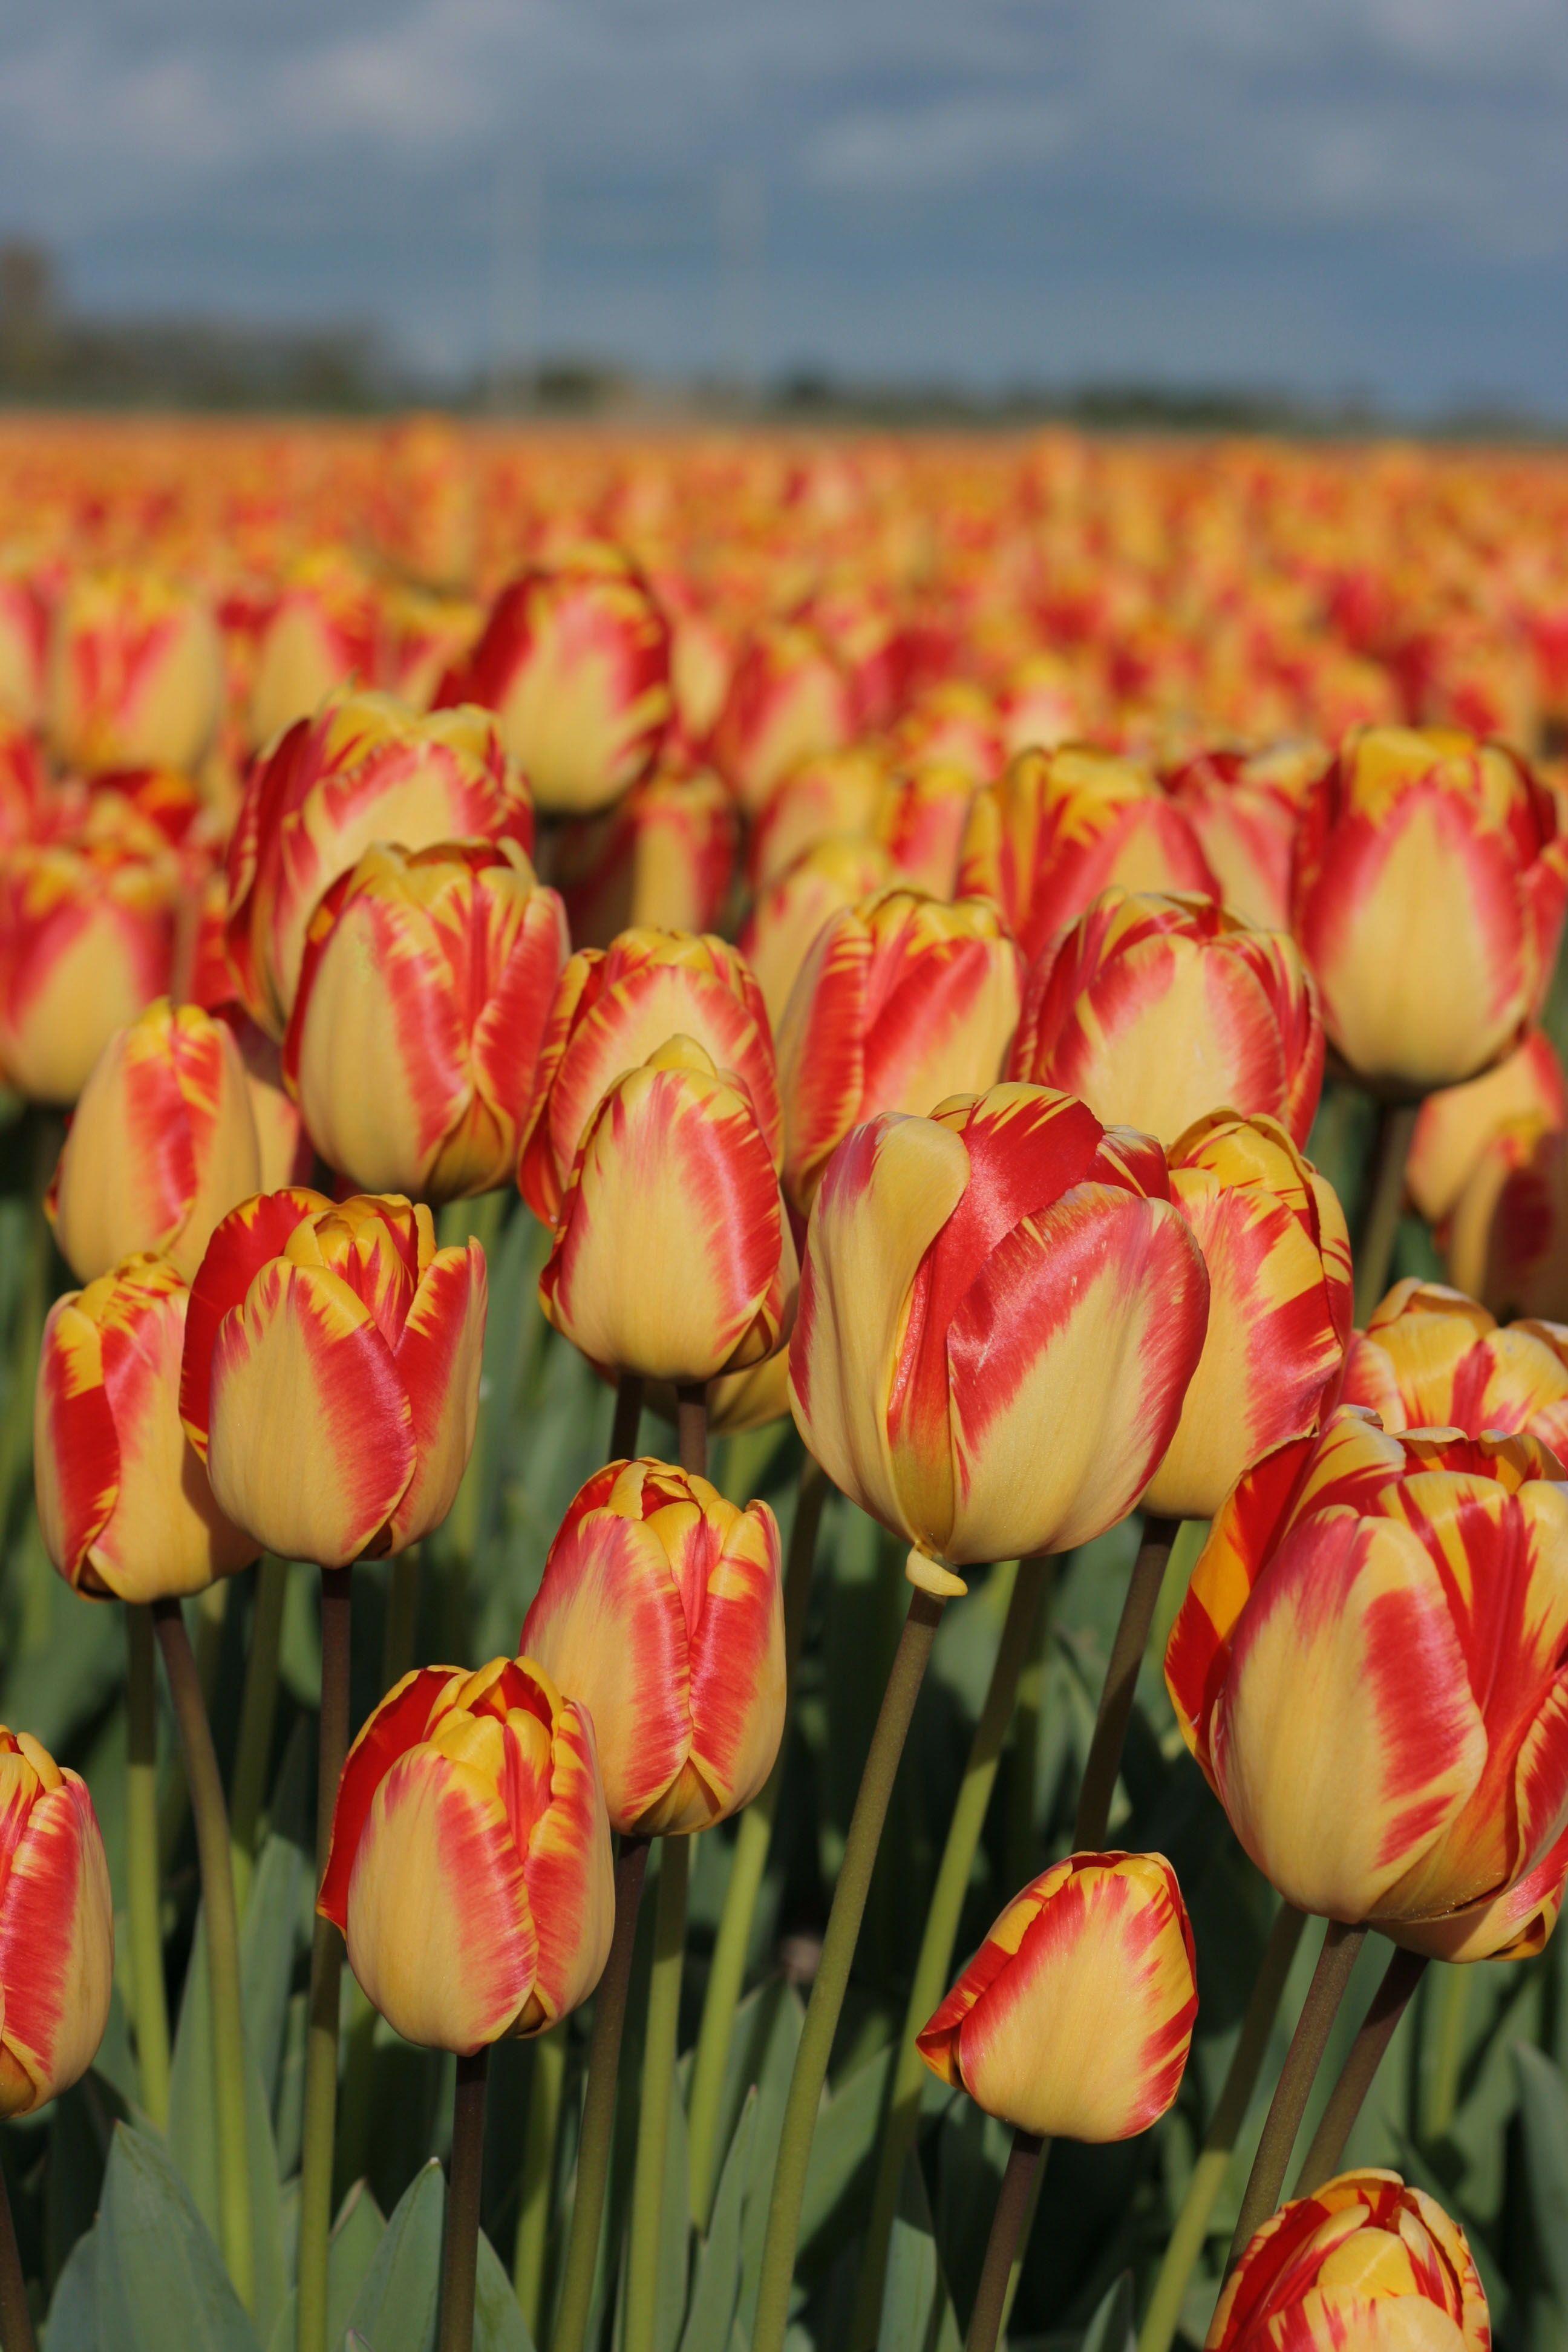 Organic Gardening Supplies Near Me Whyisorganicgardeningimportant Id 1984982011 Tulips Garden Flower Farm Tulips